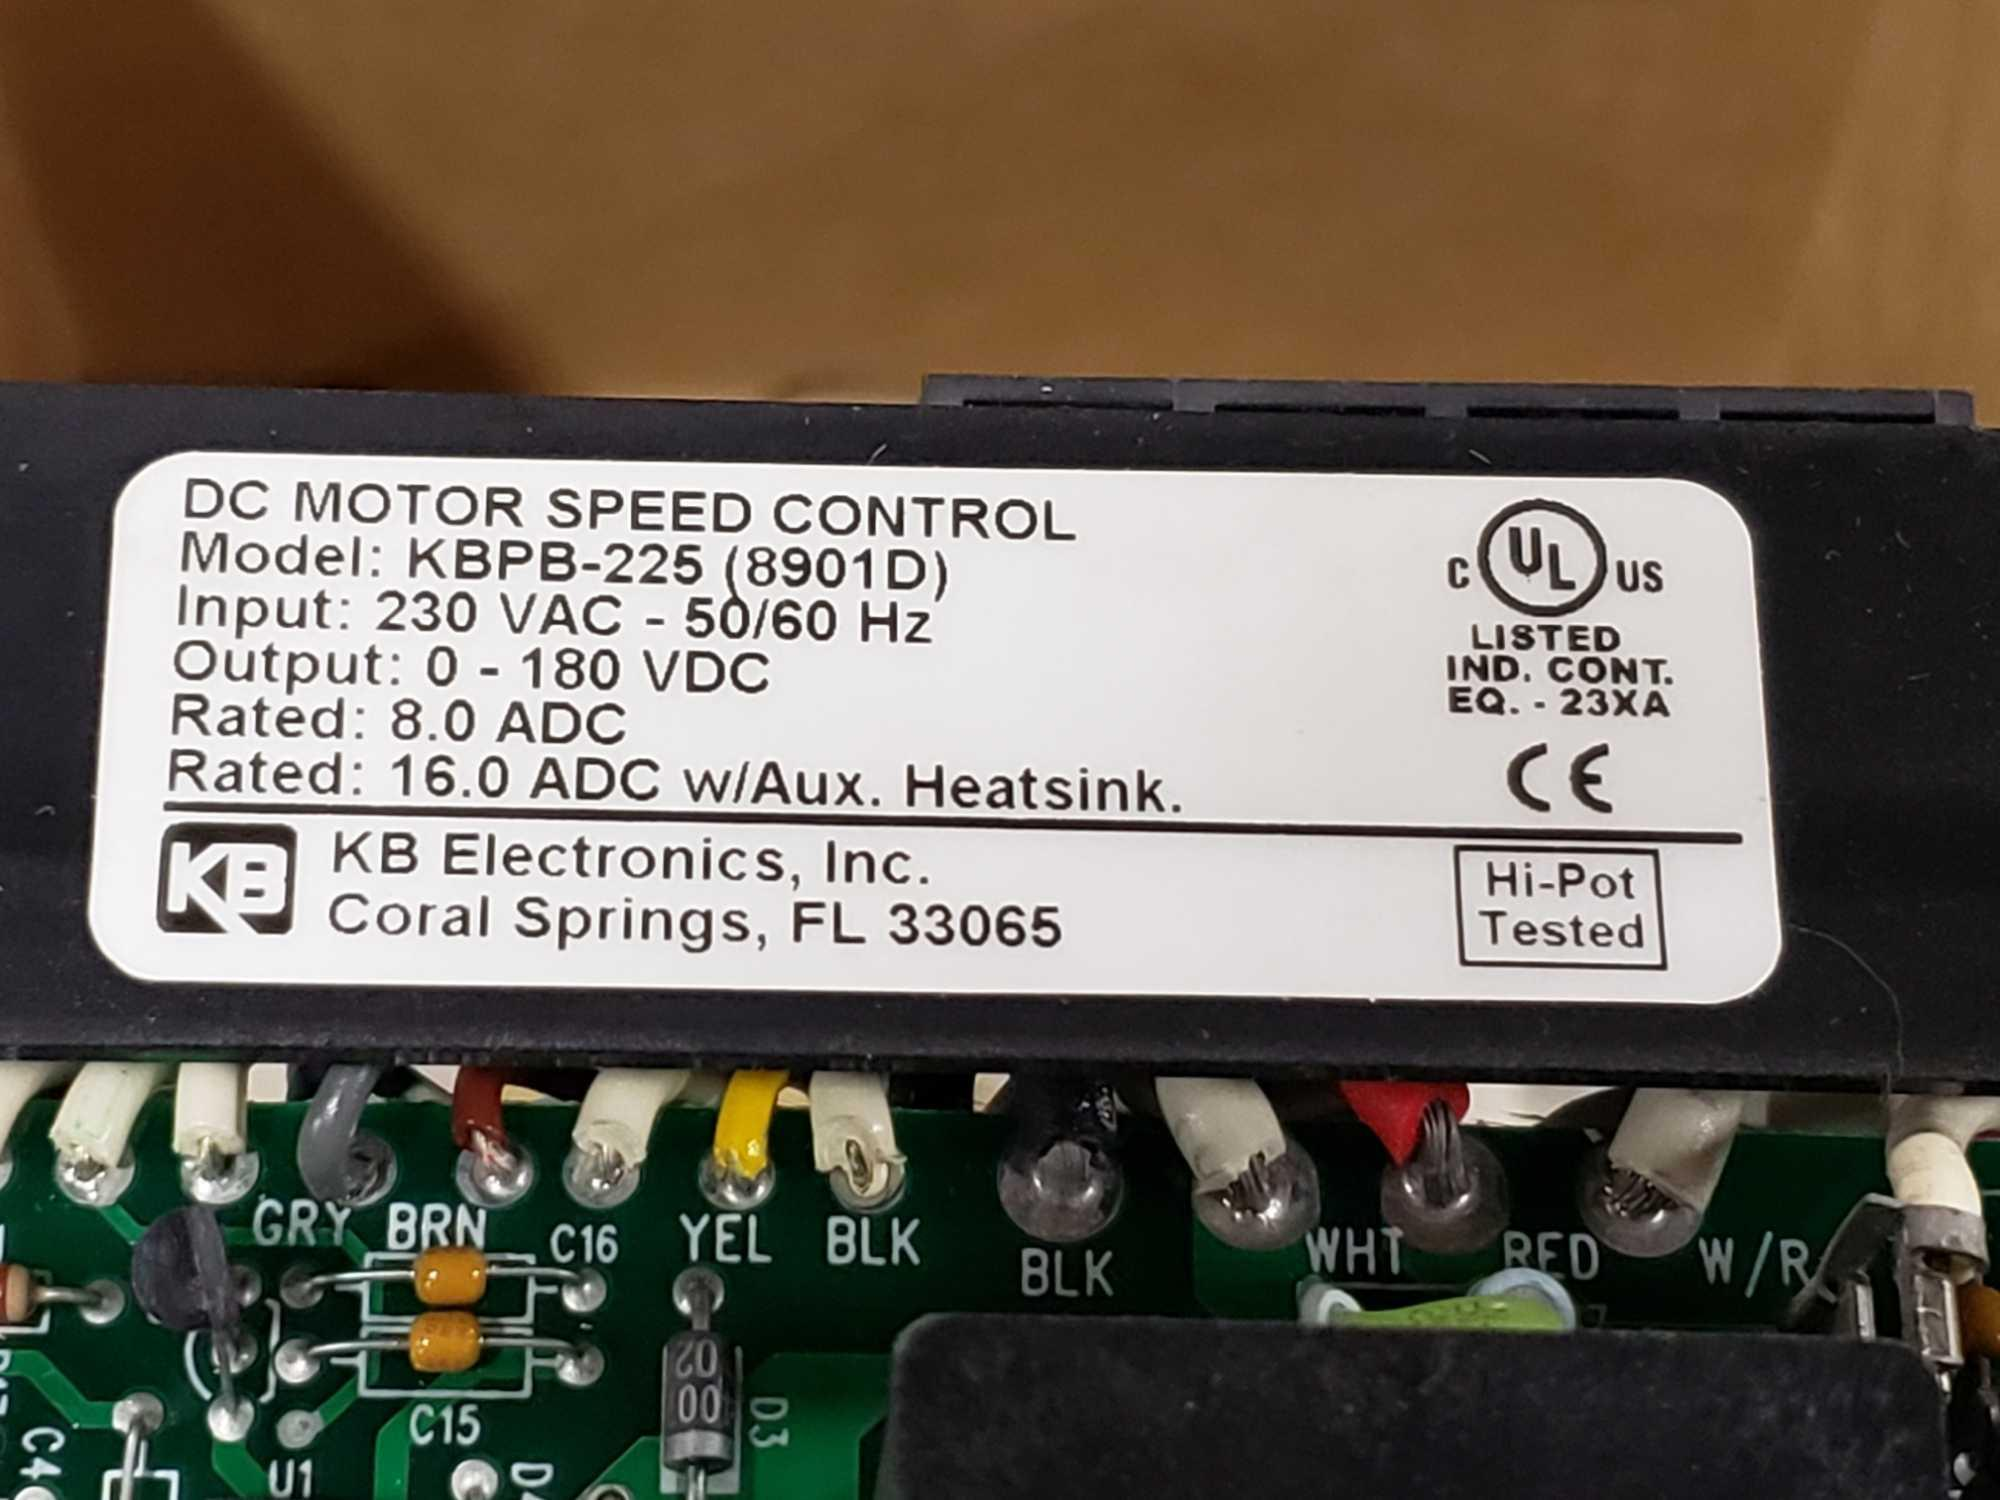 KB Penta Power reversing controld drive. Model KBPB-225, part 8901D. New in box. - Image 2 of 3